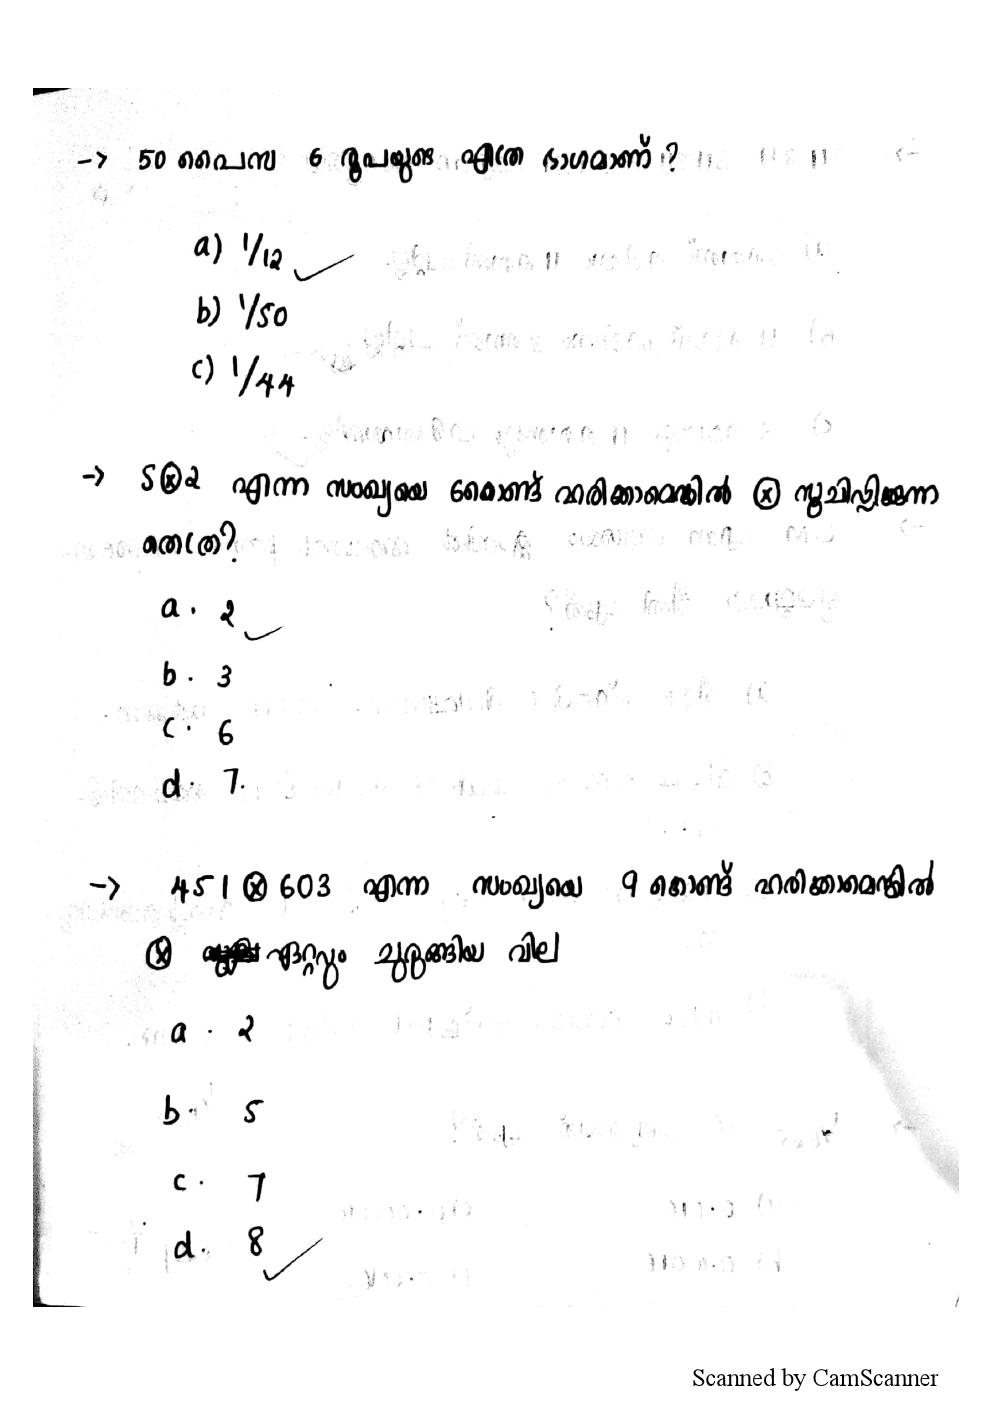 http://masterstudy.net/pdf/ktet_notes0024.png